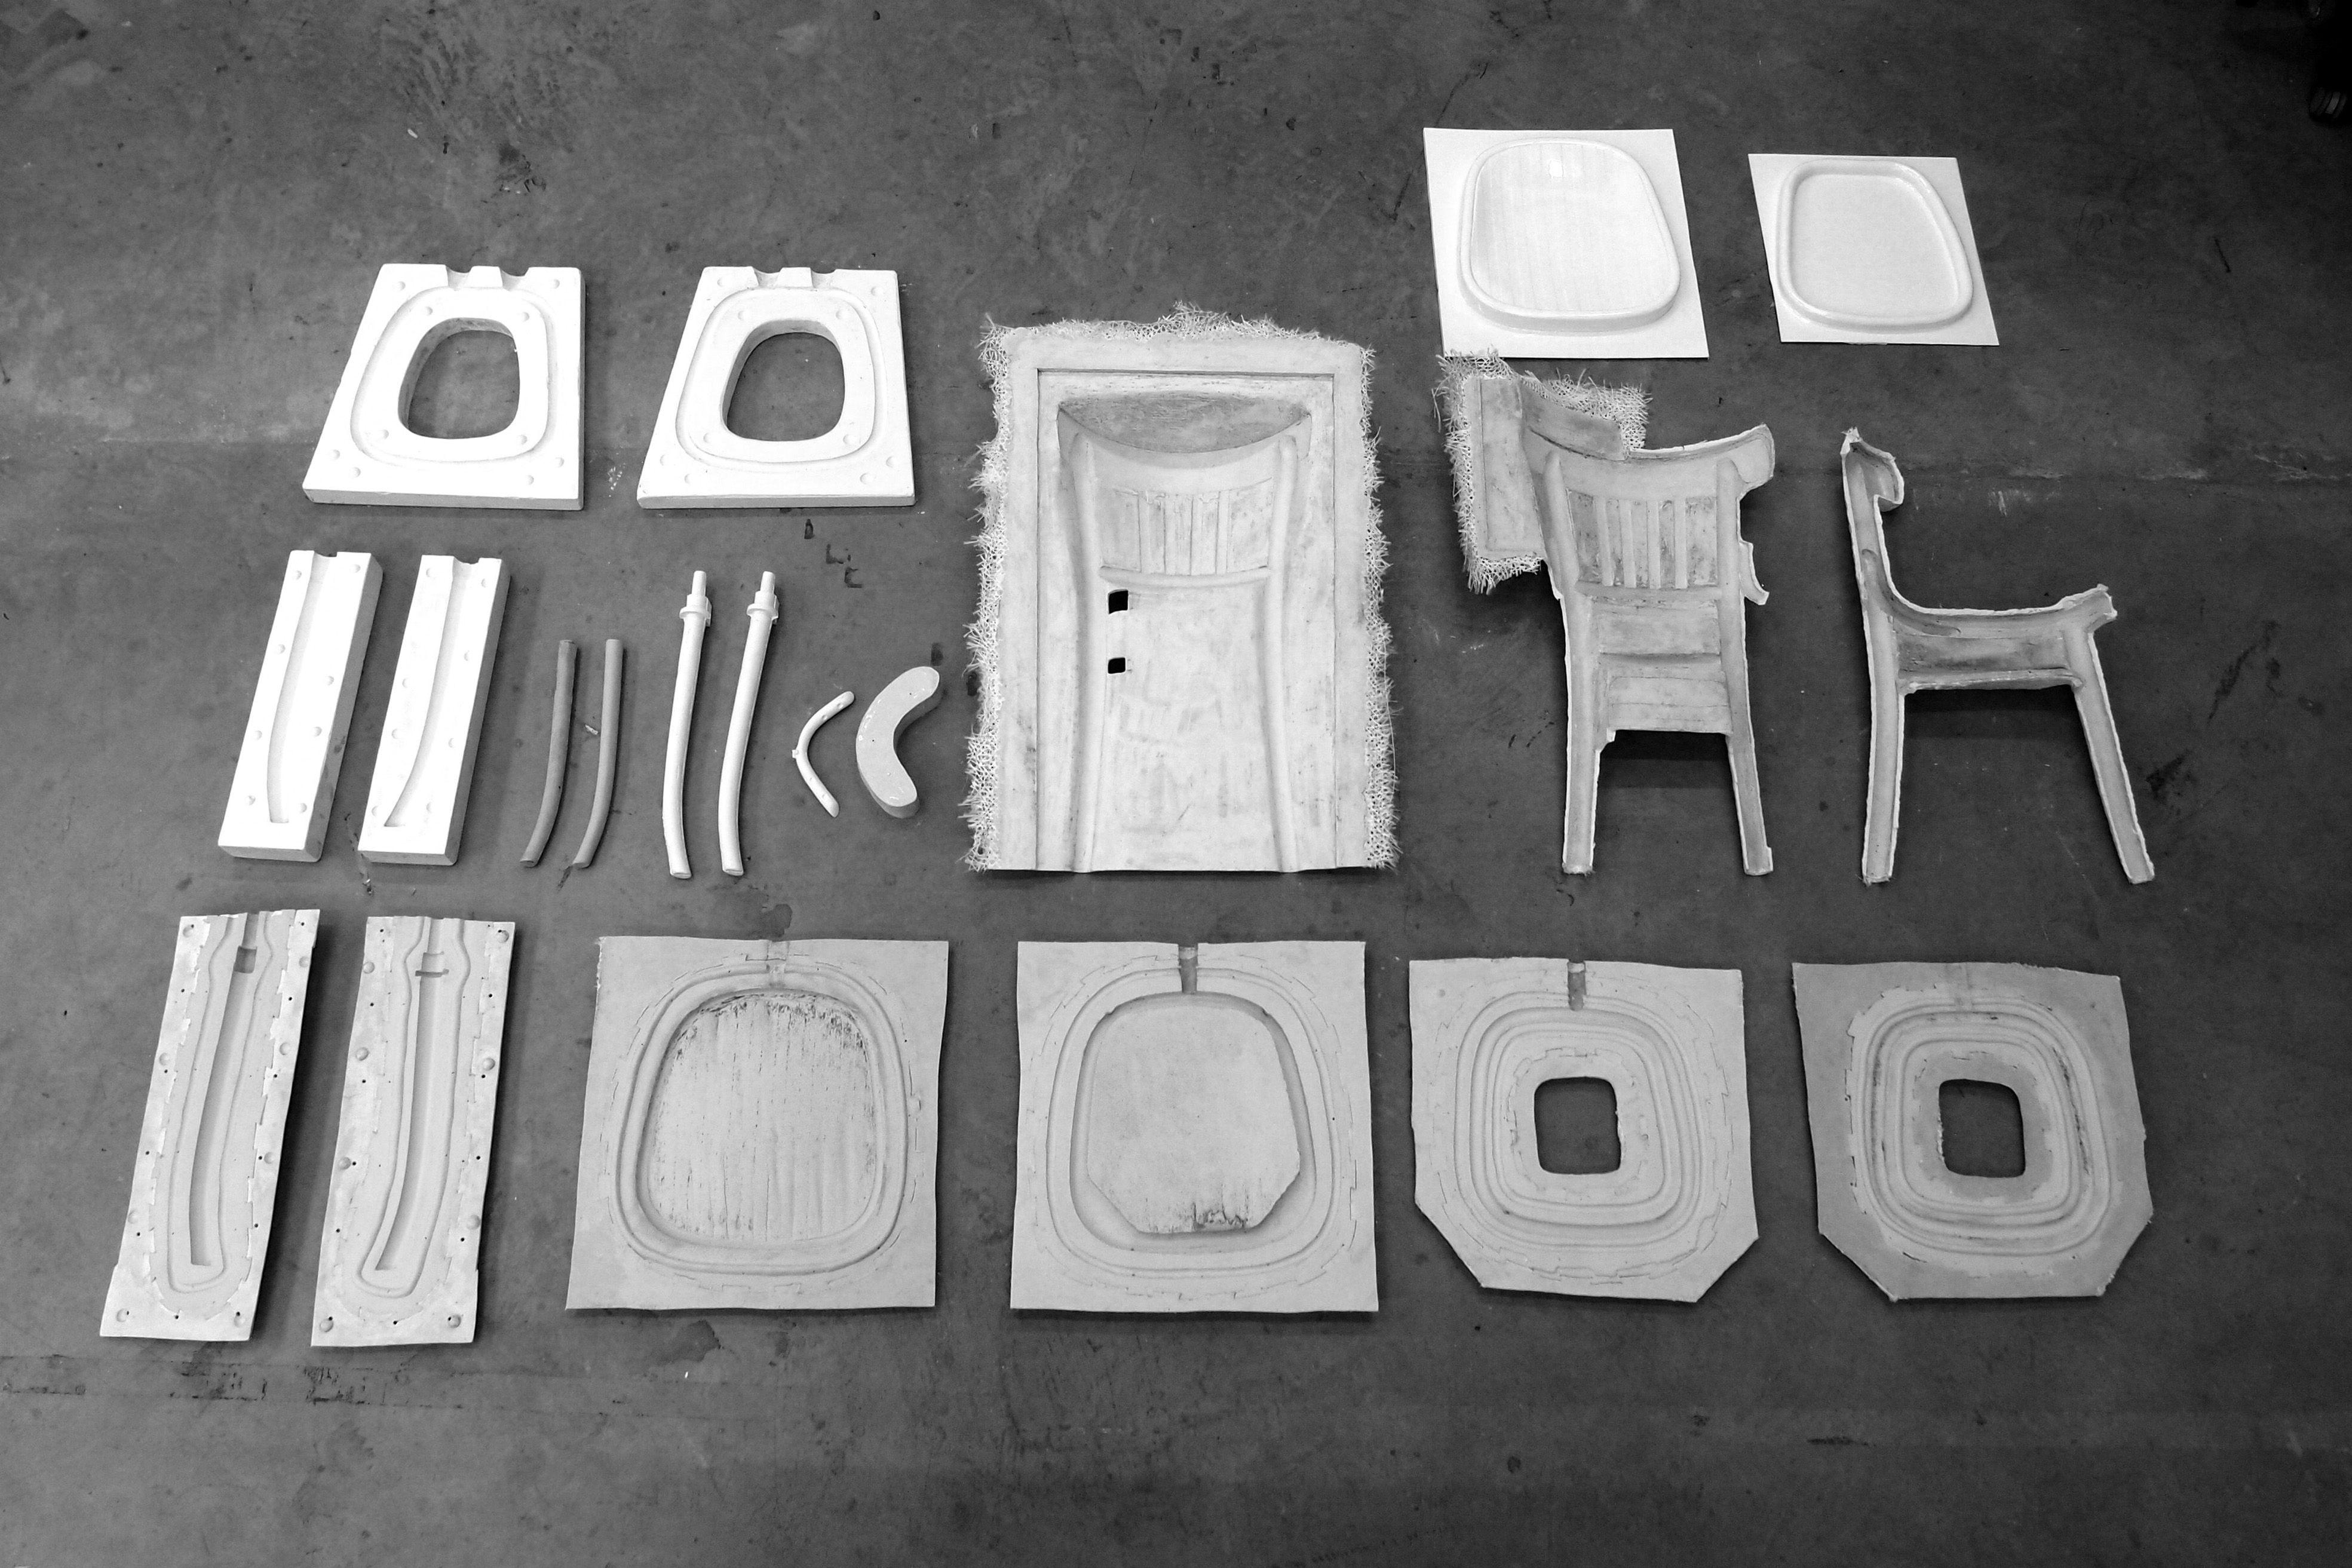 'Ceci n'est pas une chaise' - How can a replication create singularity? - Cécile Maïa Pujol - 2014 www.cecilemaiapujol.com